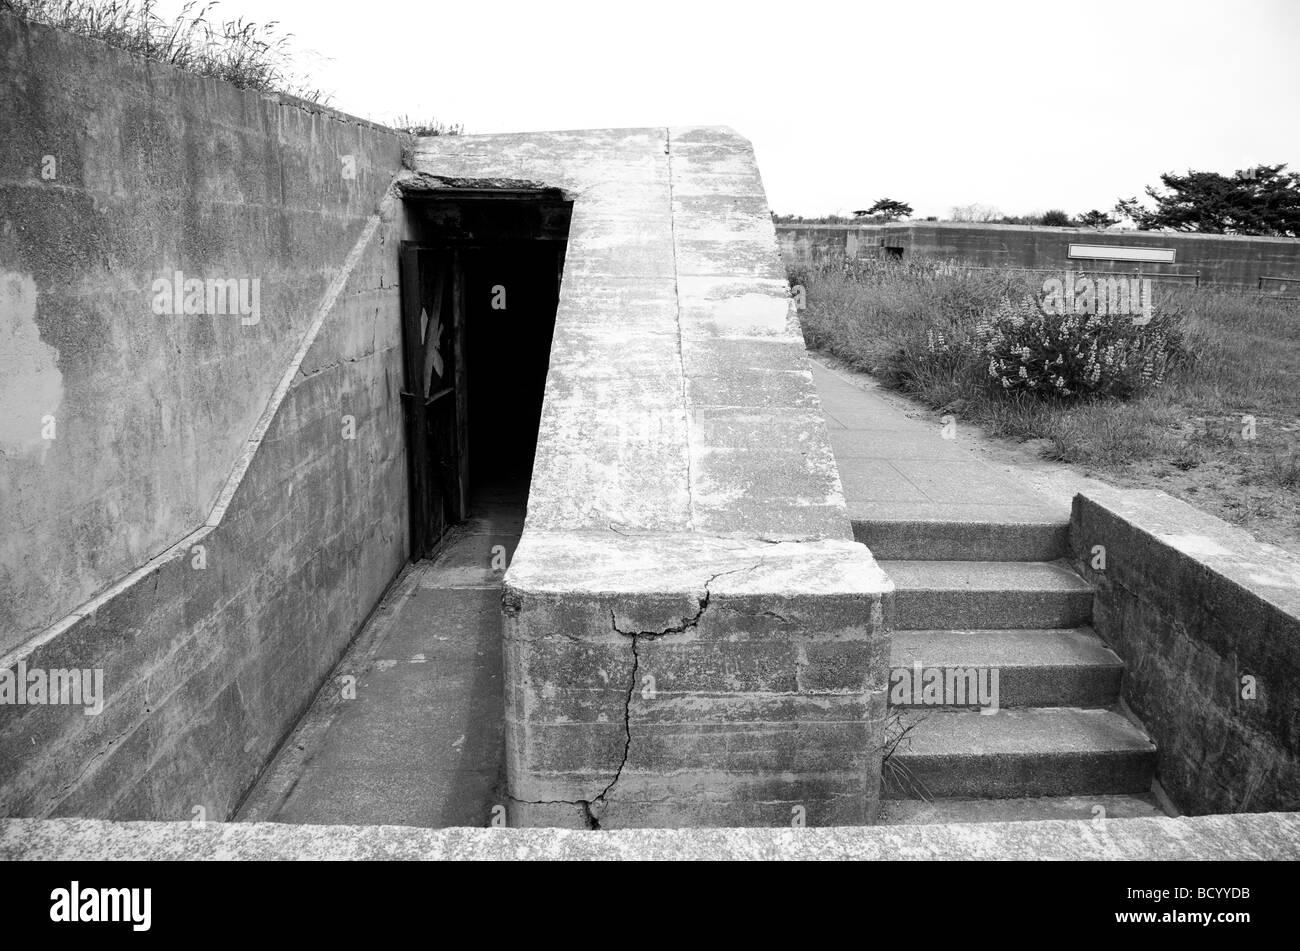 Fort Worden military bunker in Port Townsend Washington  - Stock Image